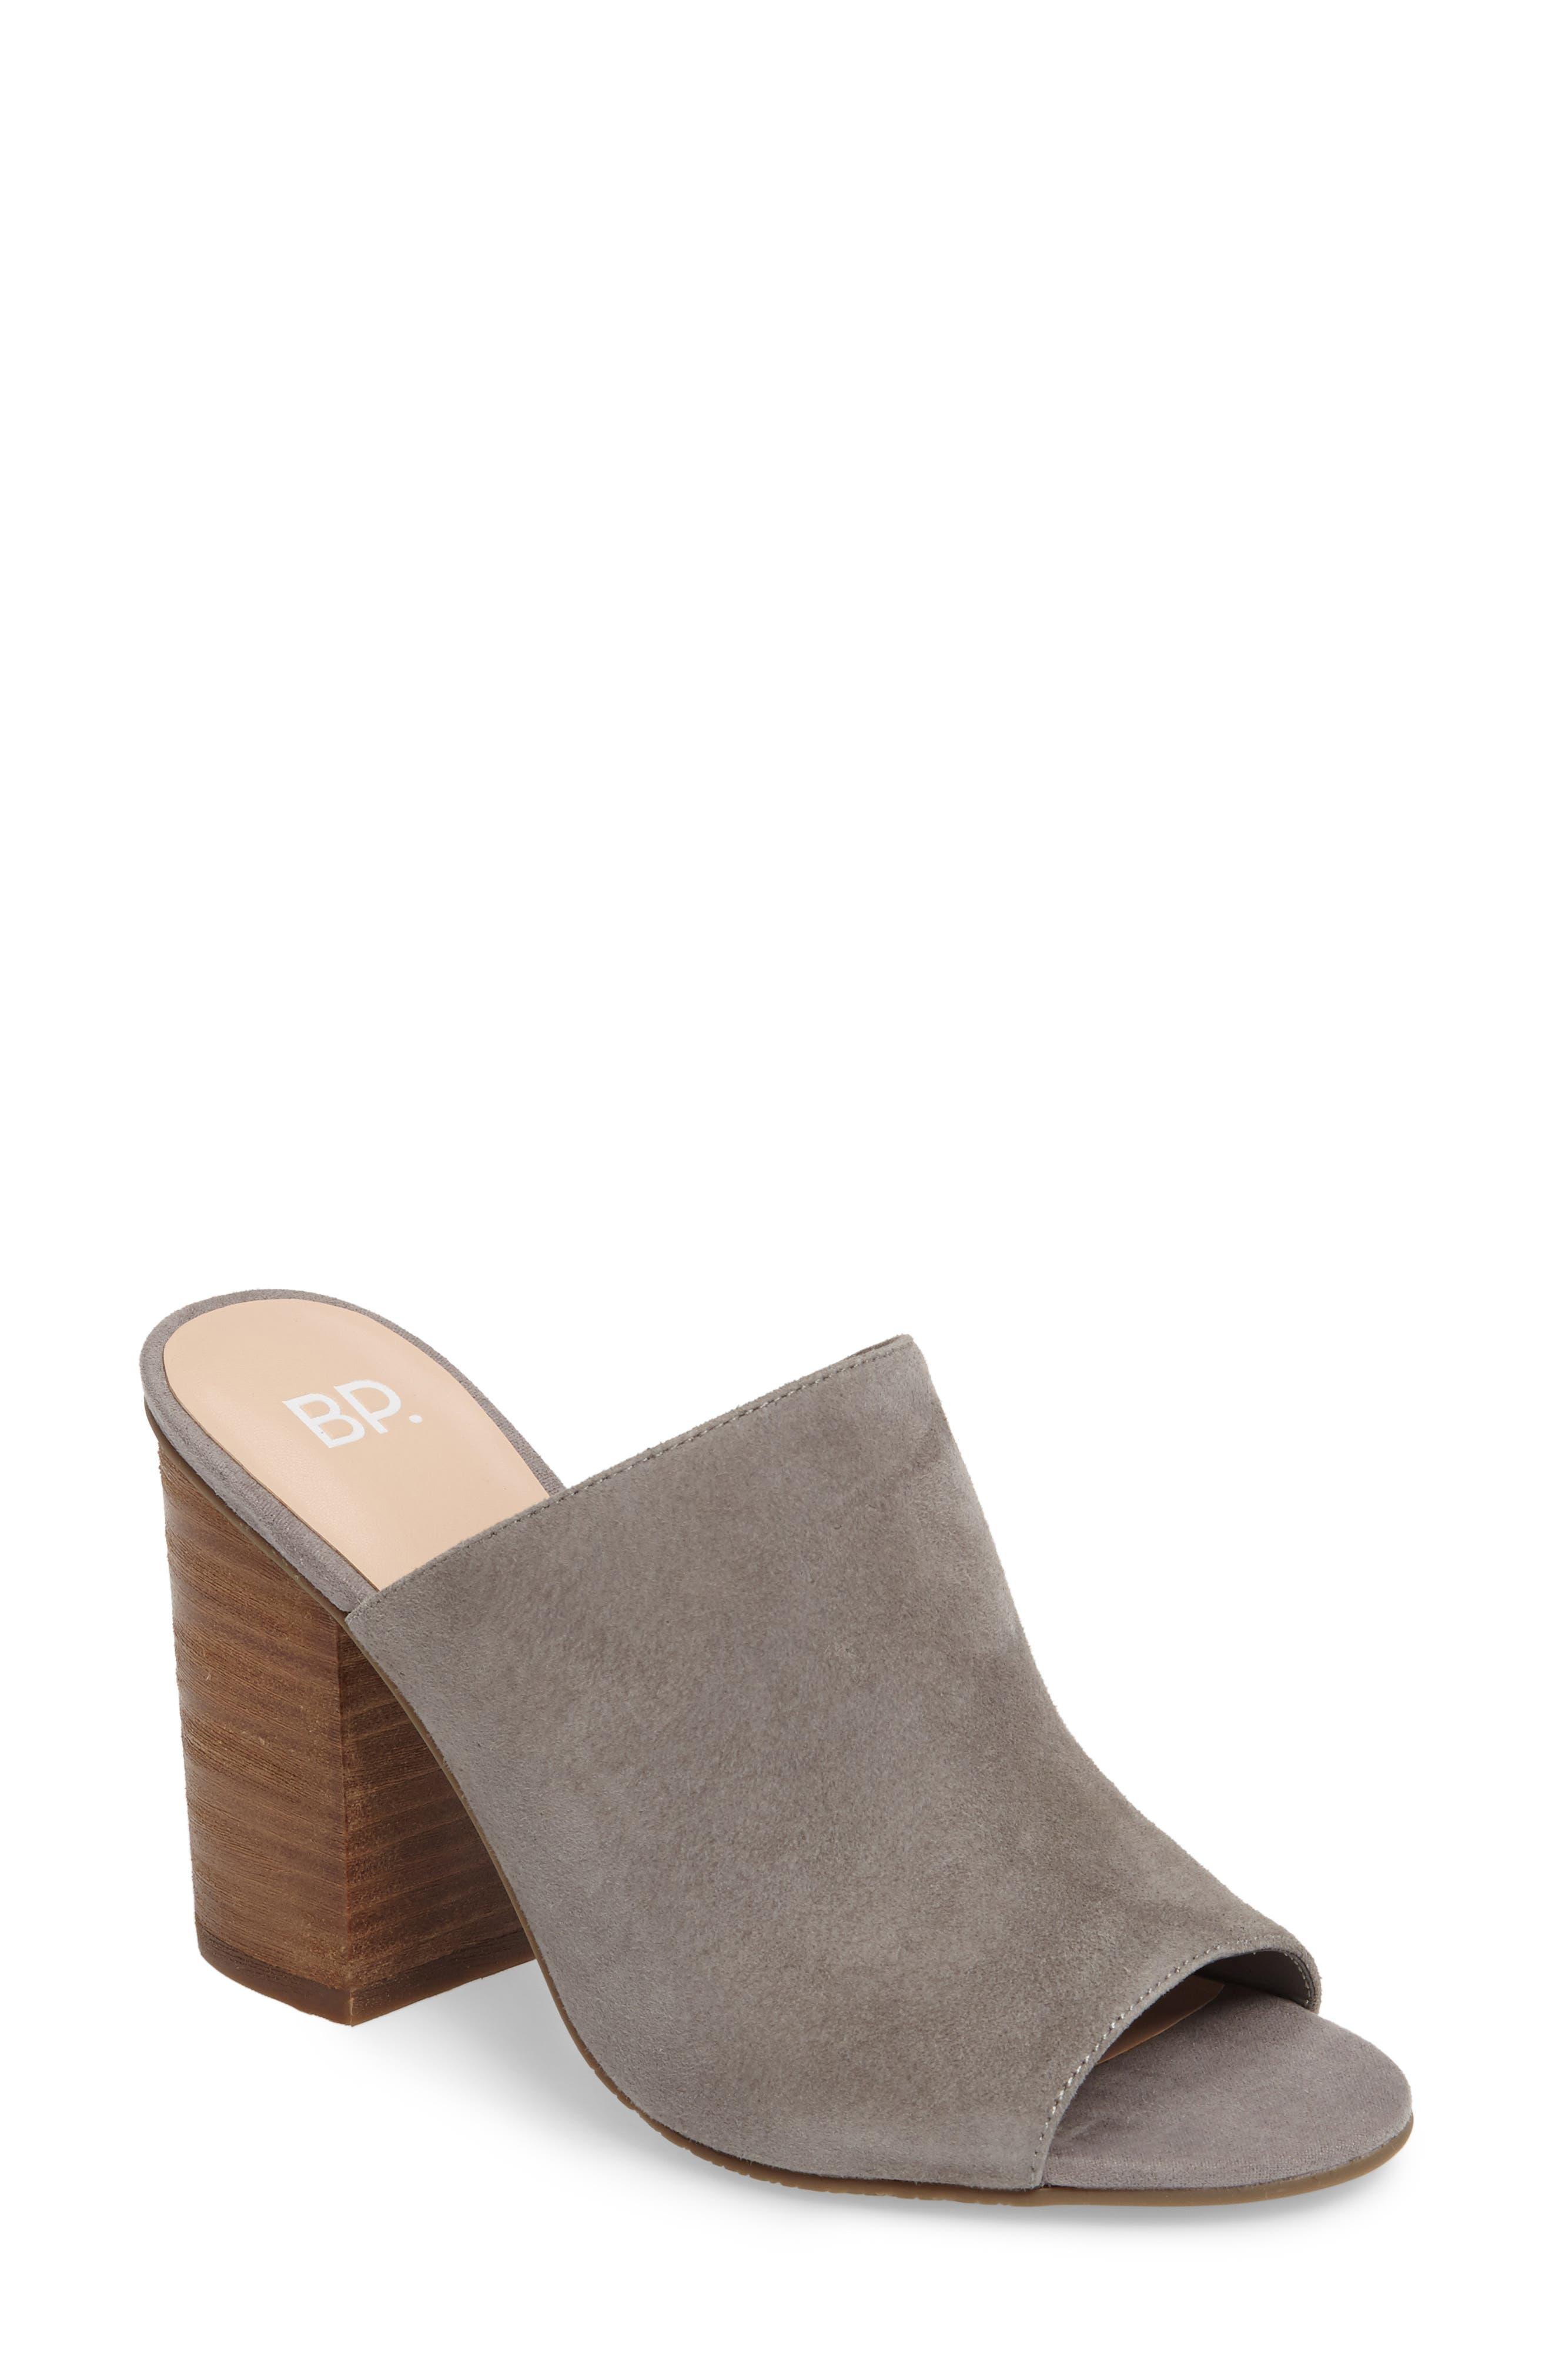 Tale 2 Mule,                         Main,                         color, Grey Suede